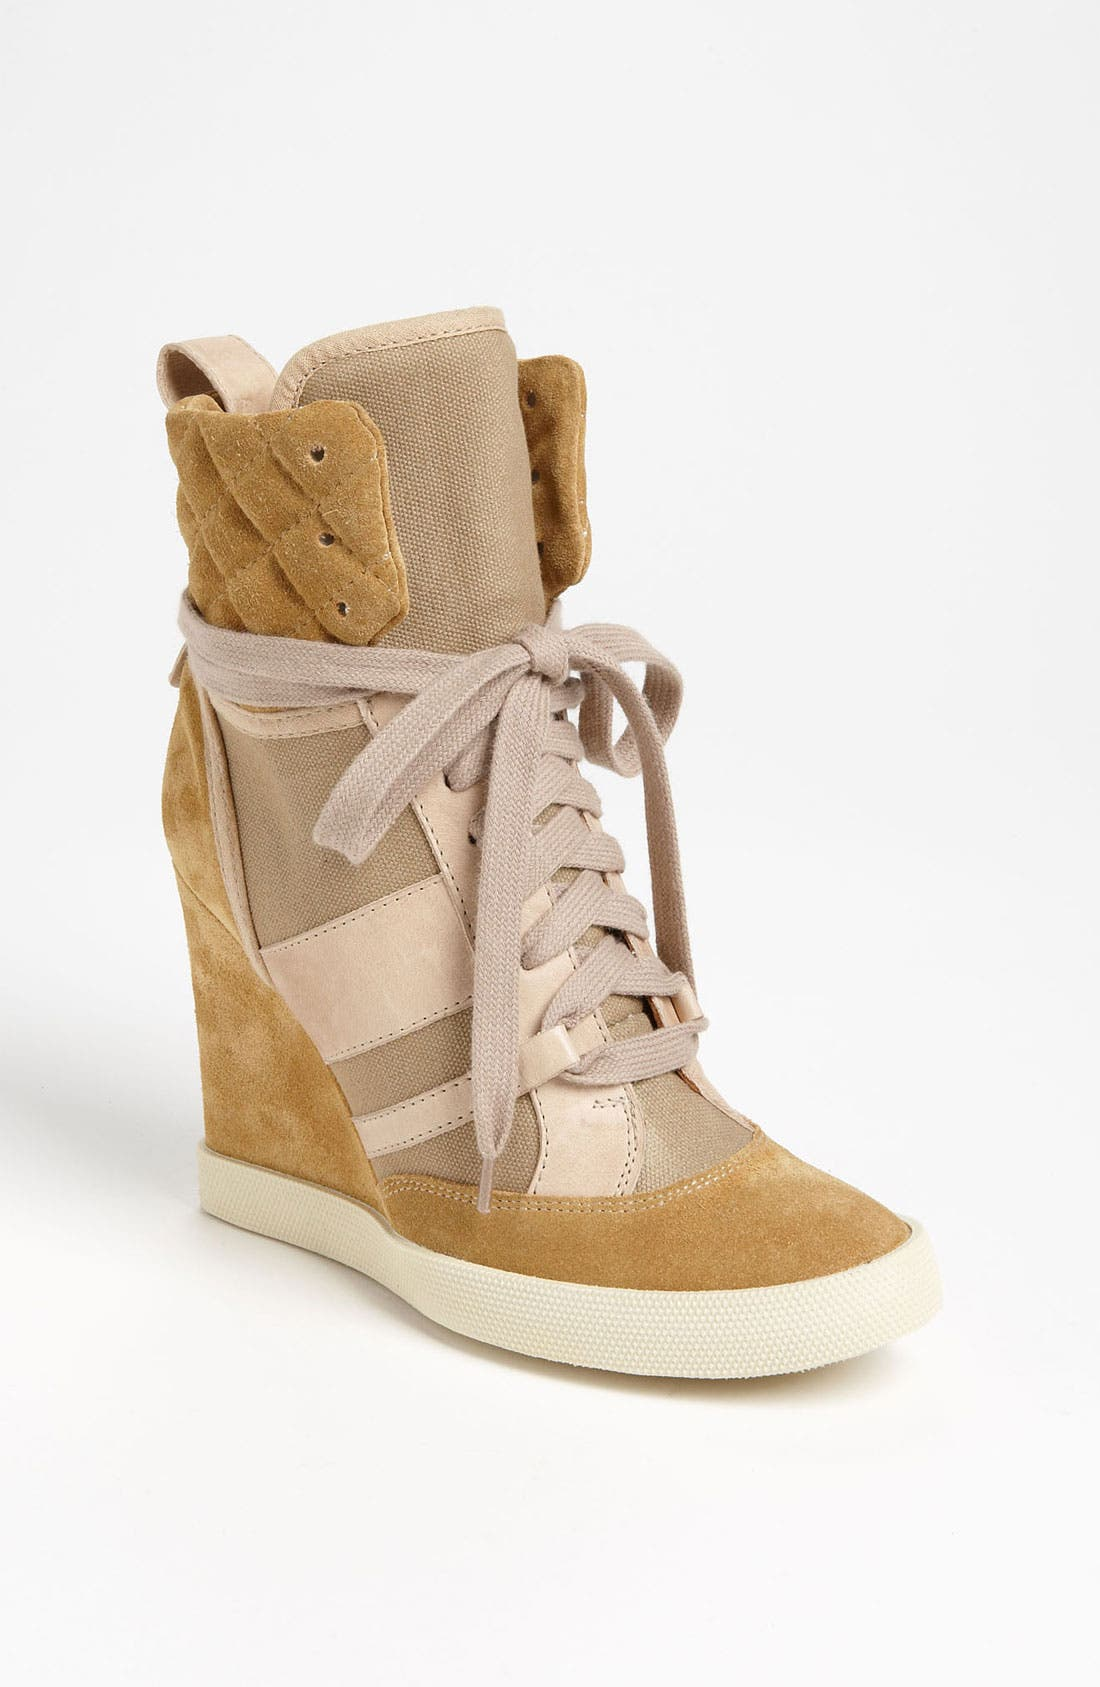 Alternate Image 1 Selected - Chloé Wedge Sneaker